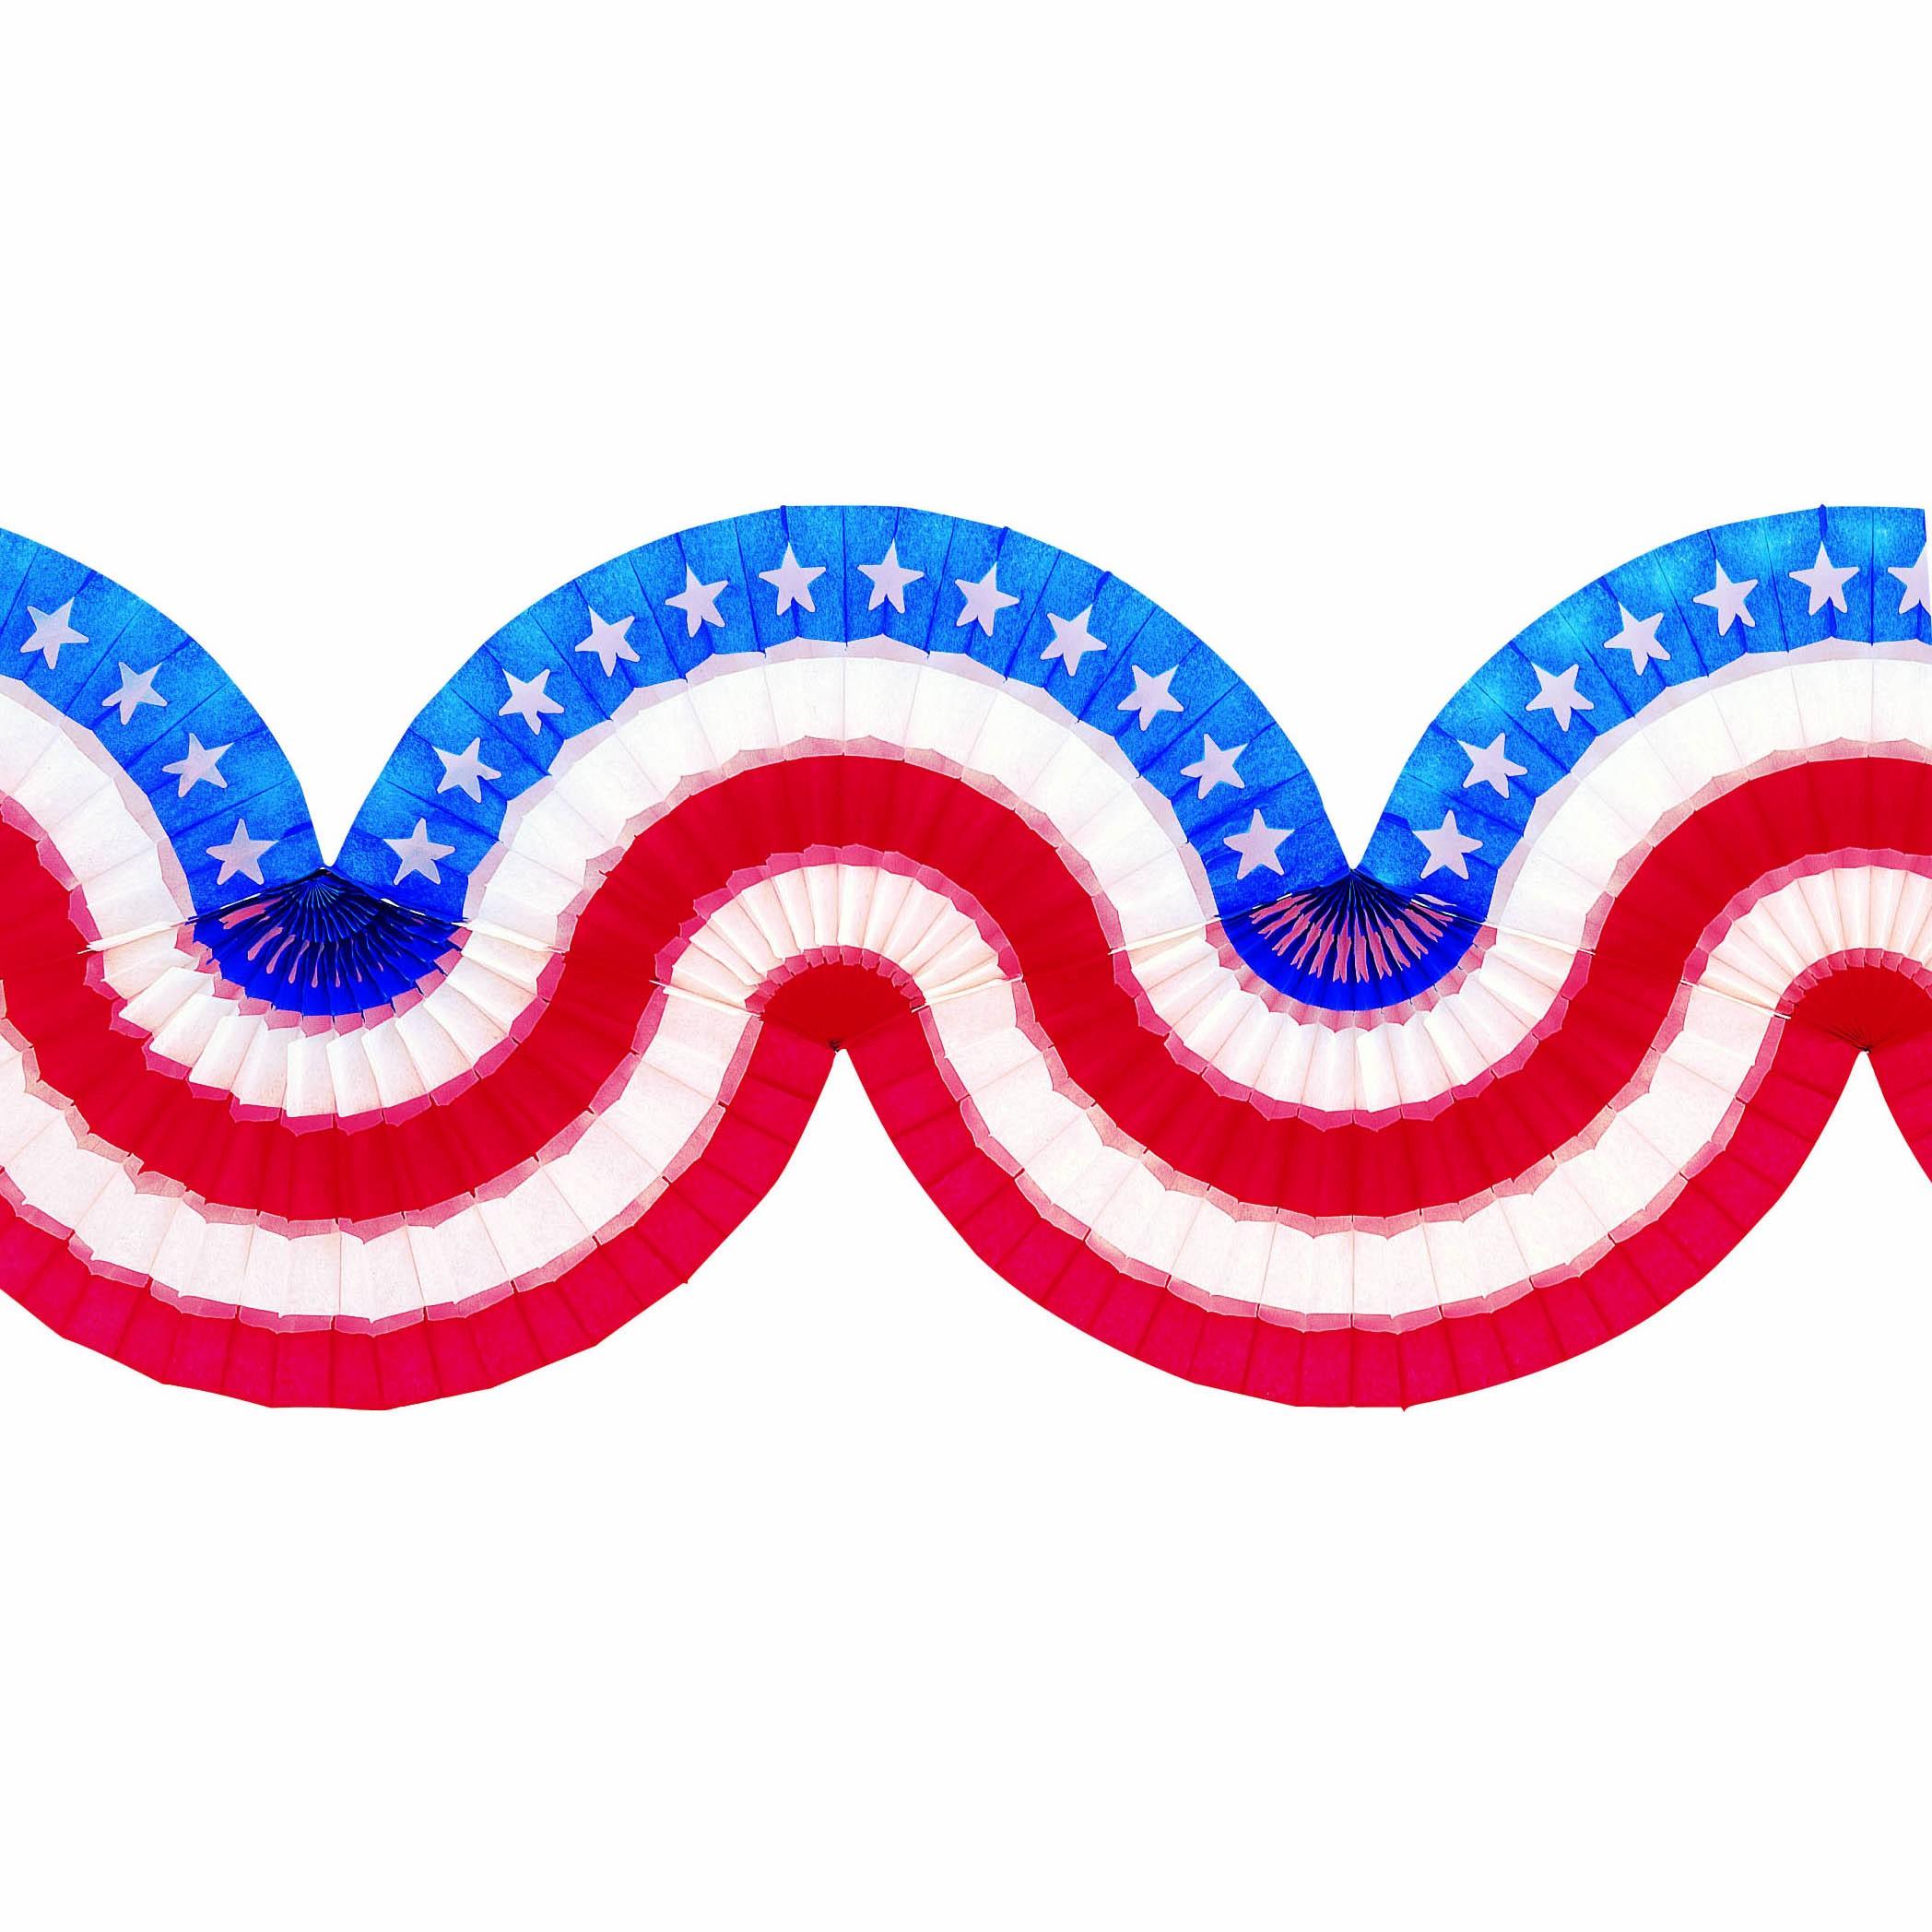 2096x2096 Patriotic Clip Arts Free Clipart Images